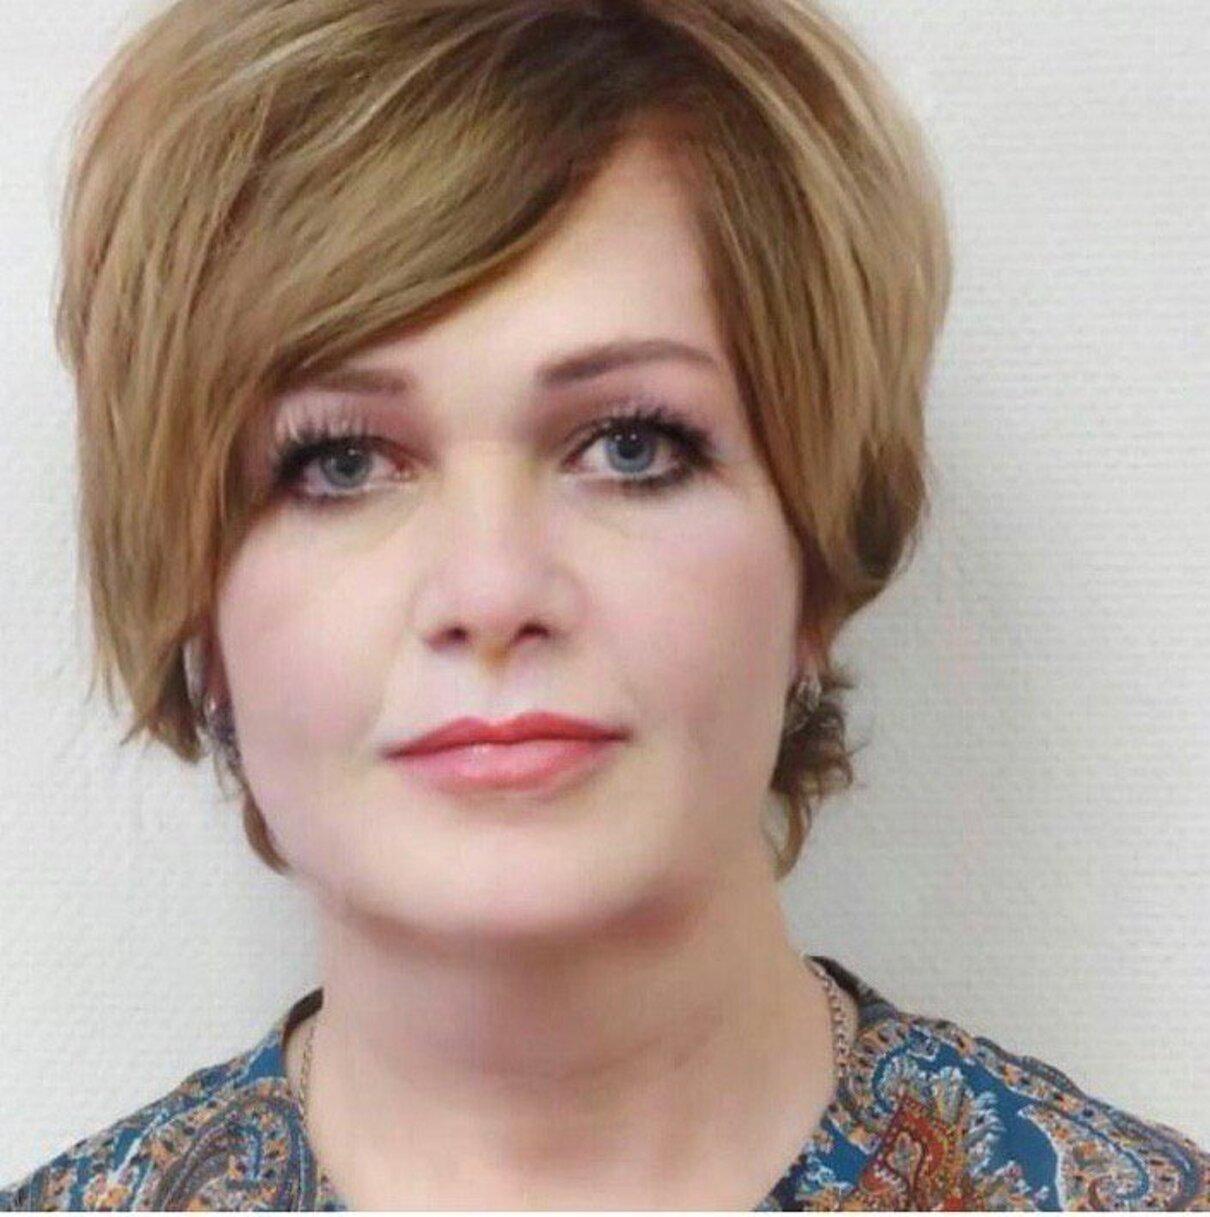 Жалоба-отзыв: Сучкова Марина Михайловна - Мошенница